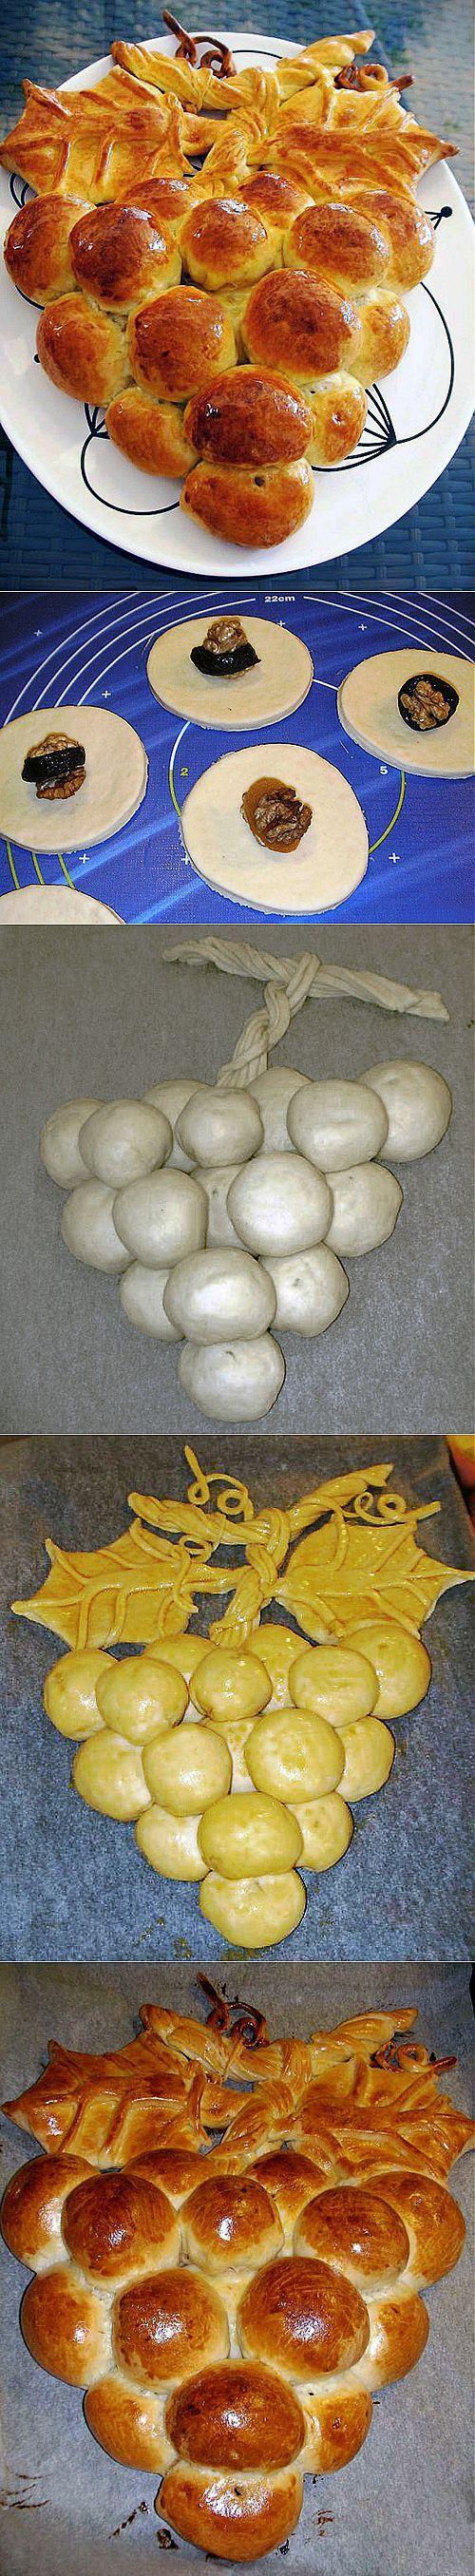 Grape shaped stuffed bread